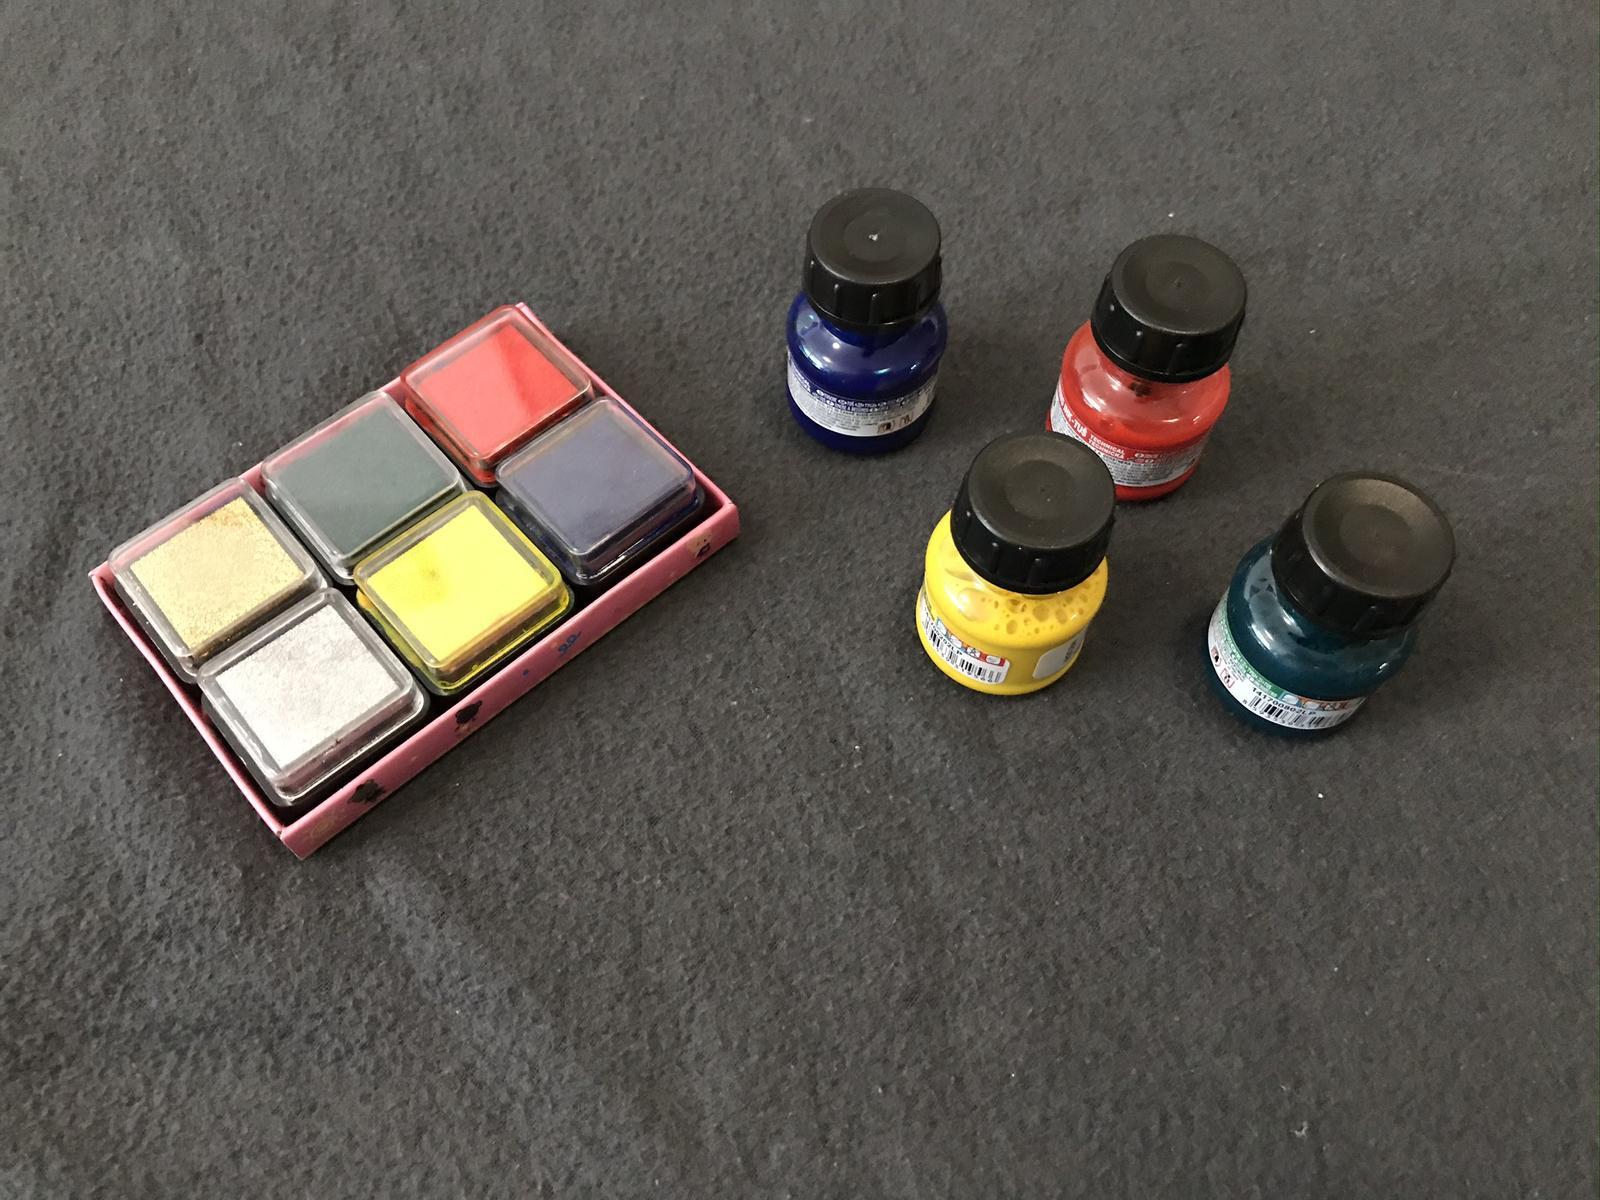 Razítkovací polštářky barevné + tuše - Obrázek č. 1